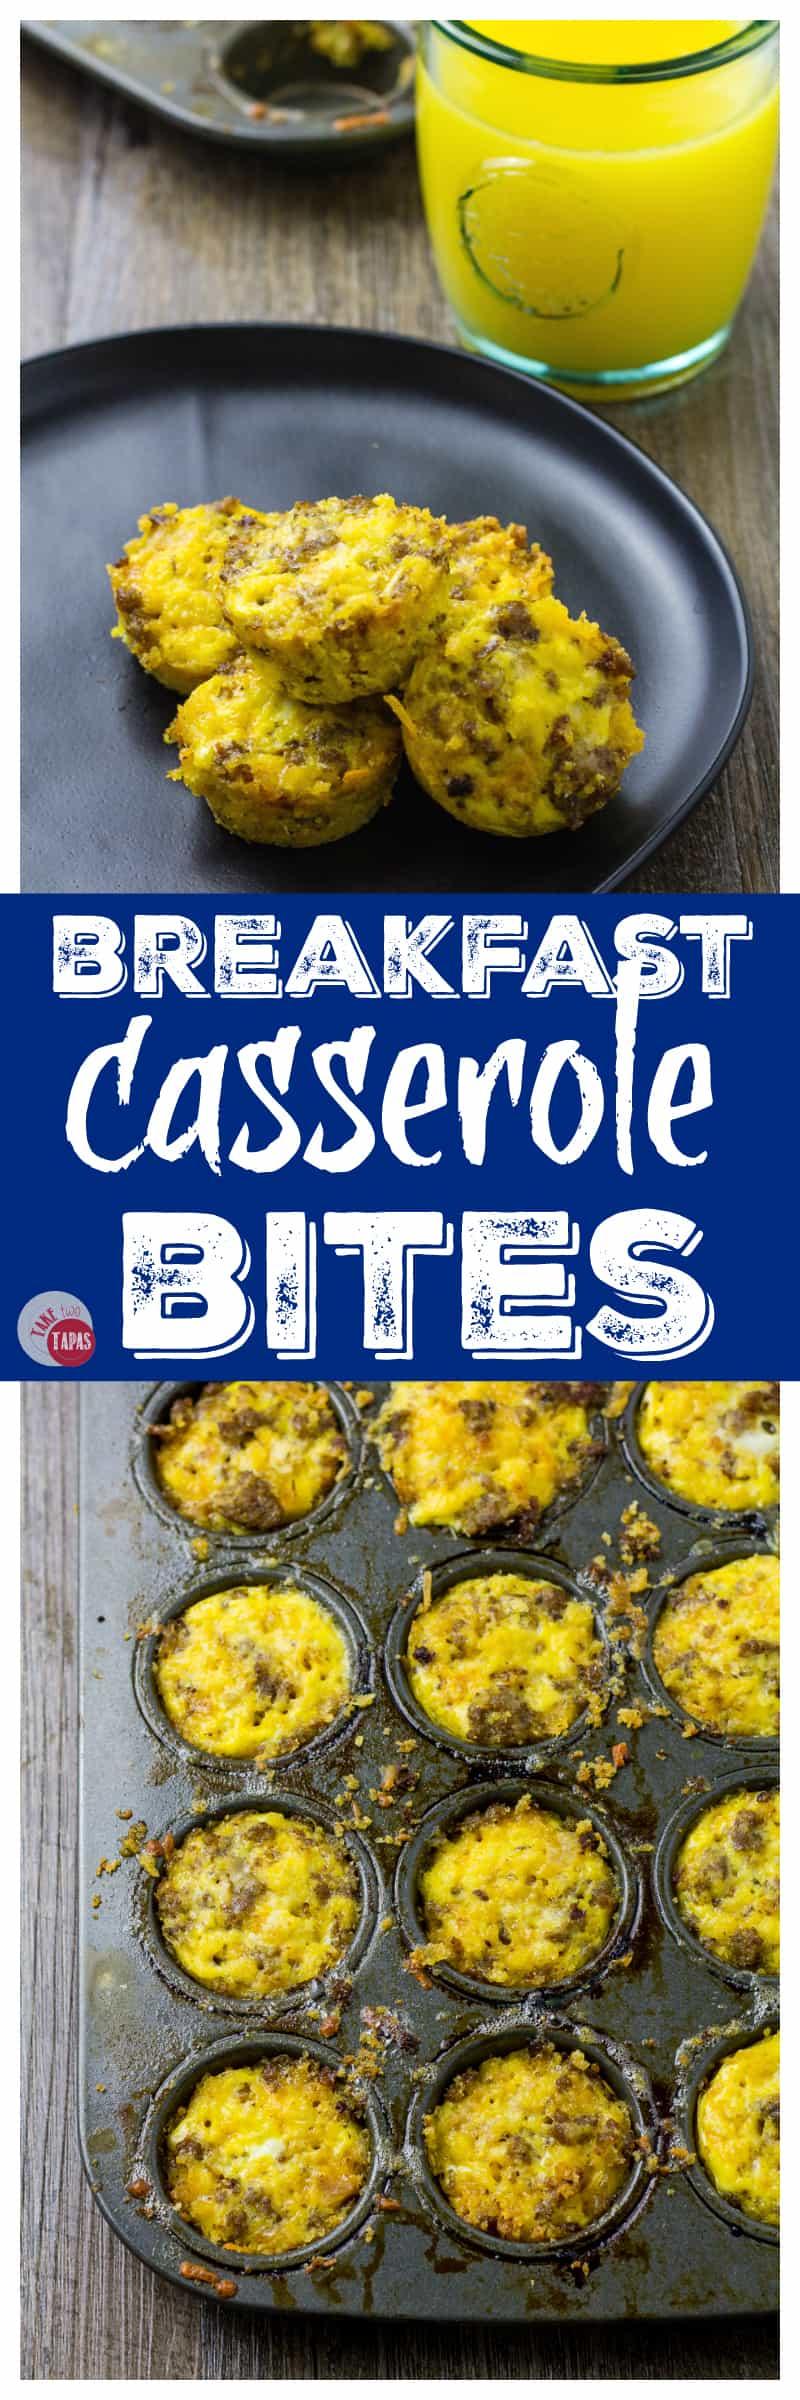 Portable Morning Breakfast Casserole Bites | Take Two Tapas | #Breakfast #Casserole #Bites #MiniMuffins